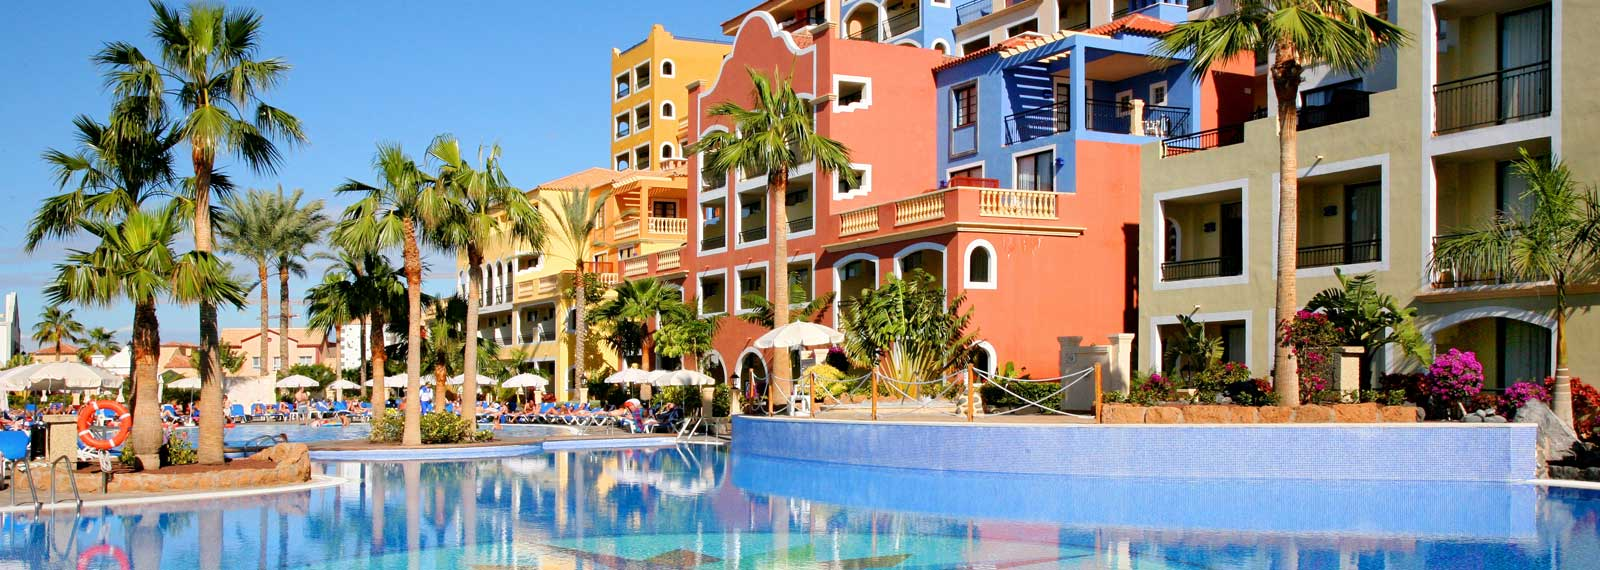 Bahia Principe Tenerife Bahia Principe Hotels Amp Resorts